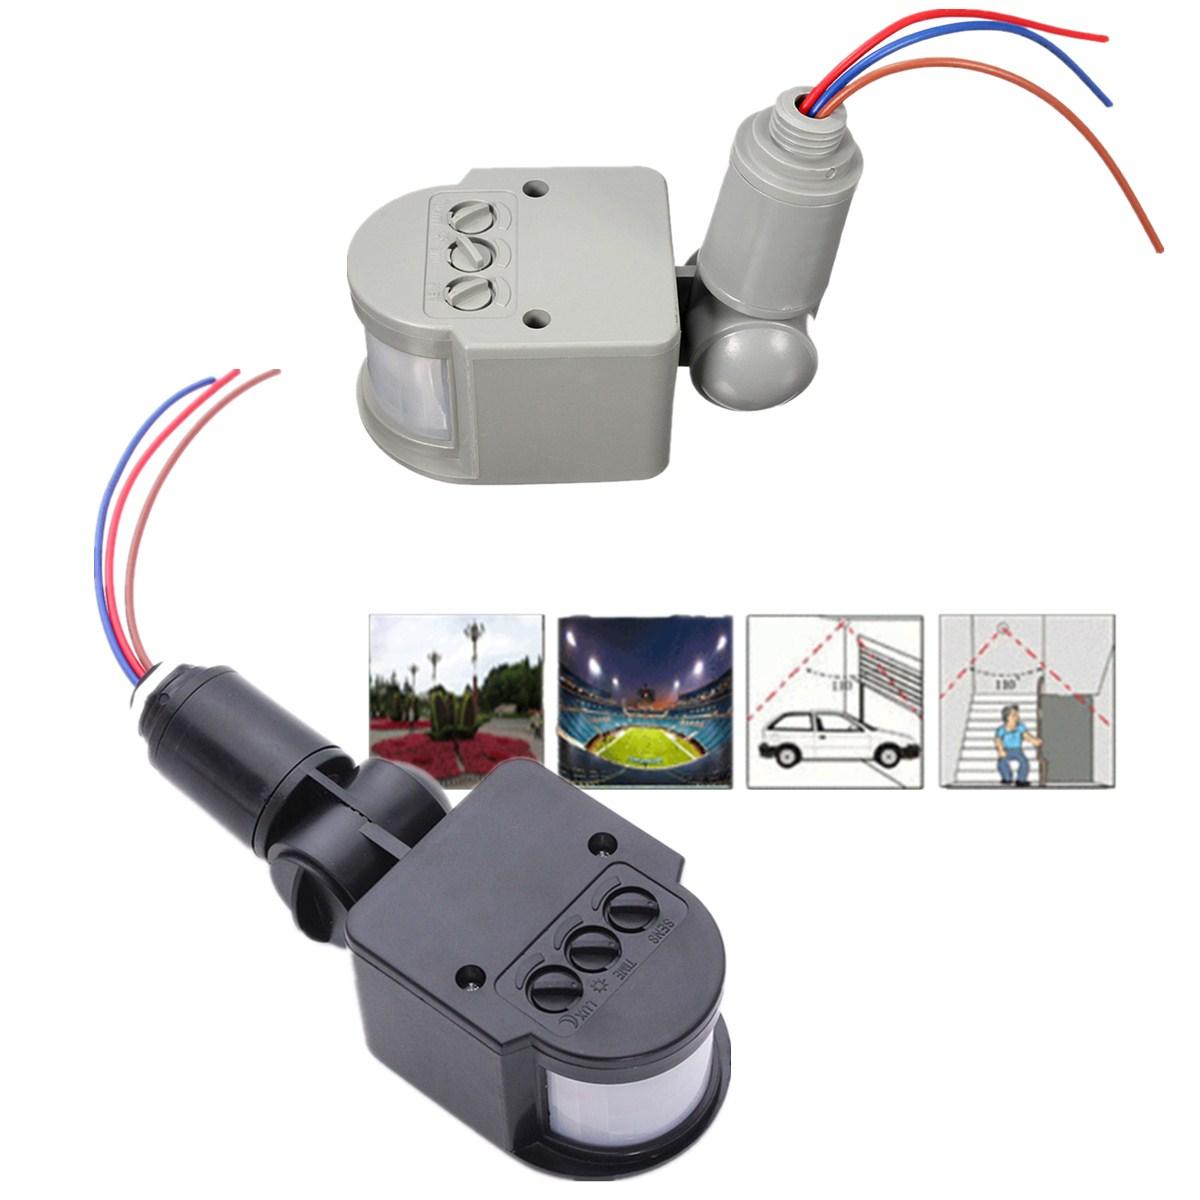 hight resolution of 110v 240v led outdoor infrared pir motion sensor detector motion sensor light diagram heath zenith motion sensor wiring